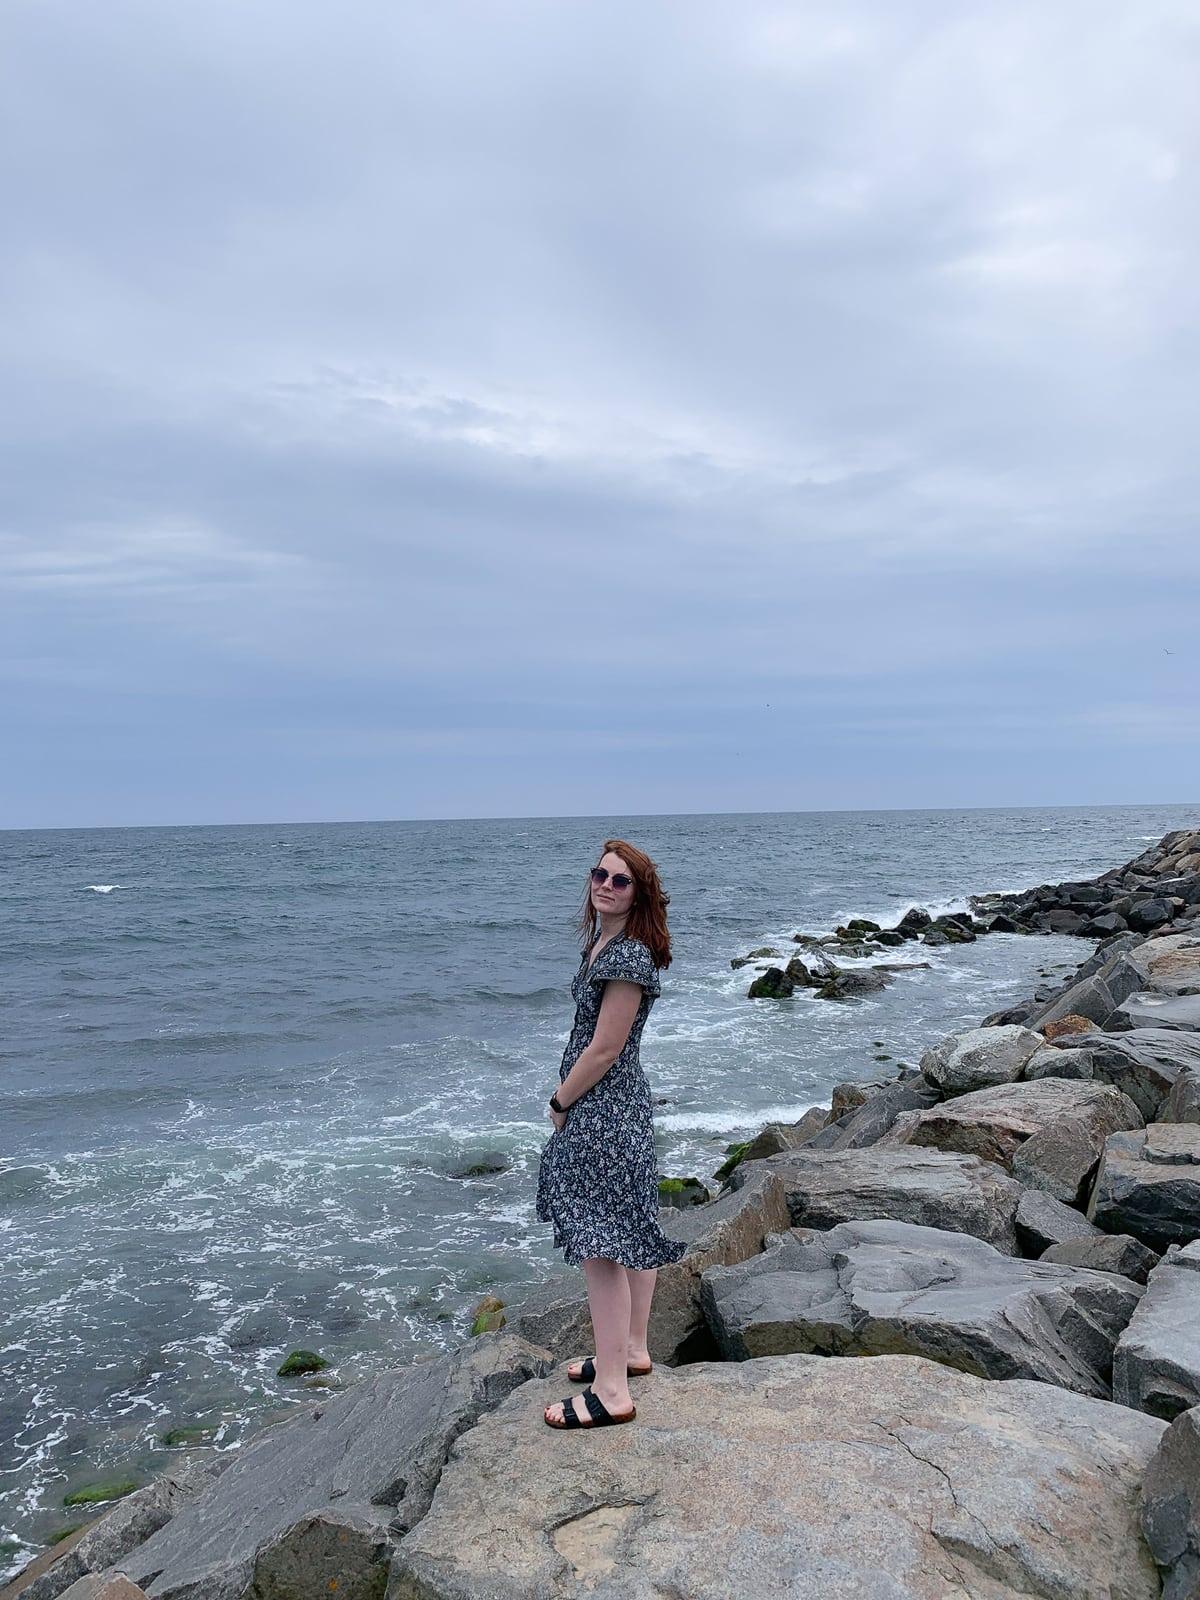 Girl standing on top of rocks next to crashing ocean waves